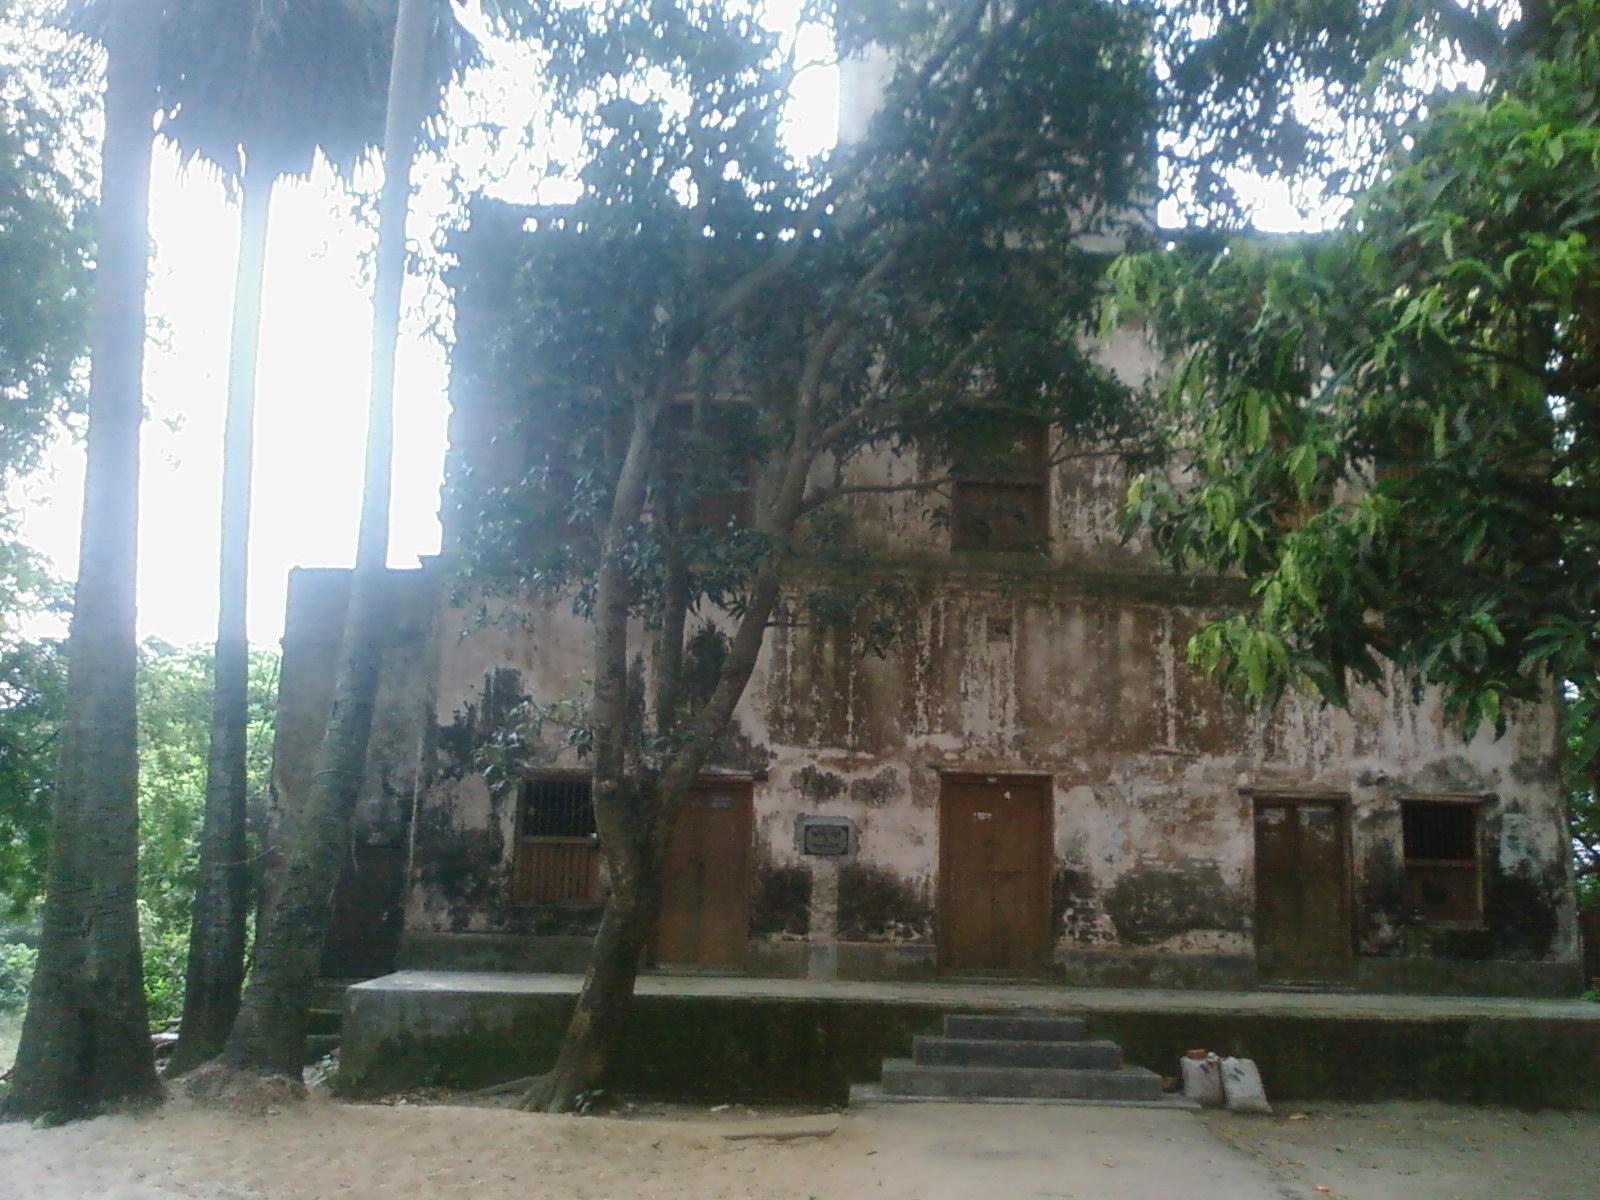 Paternal house of Jyoti Basu at Barodi in Narayanganj, Bangladesh